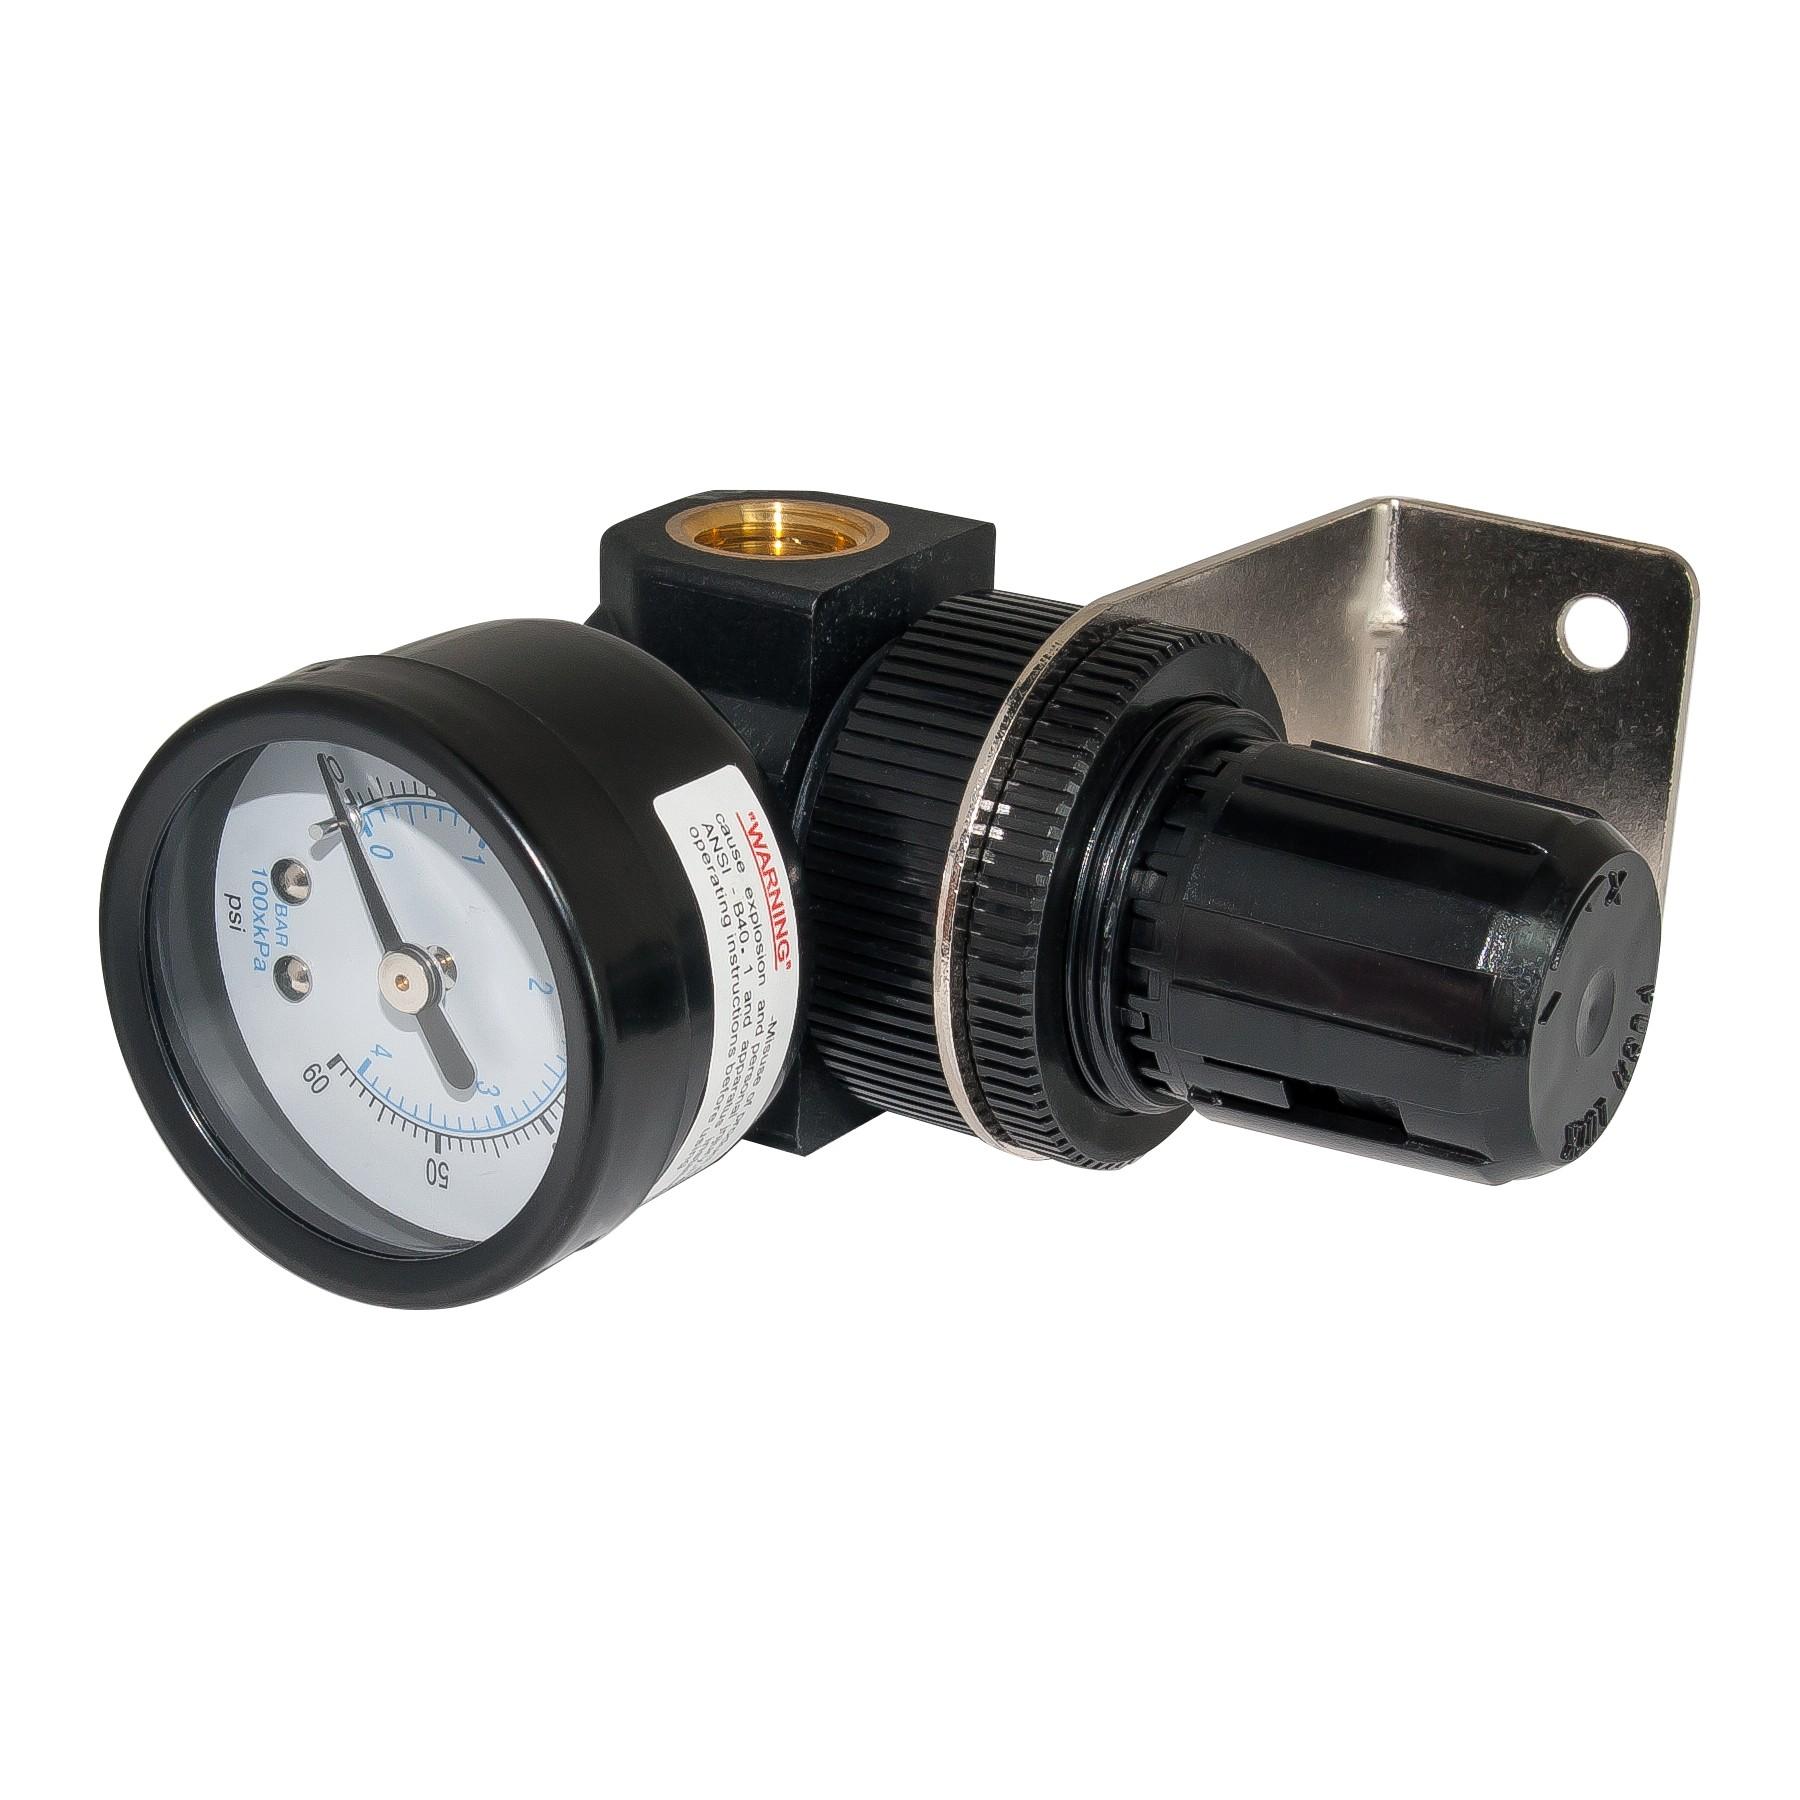 Mini Diaphragm Air Regulator, 60psi Gauge